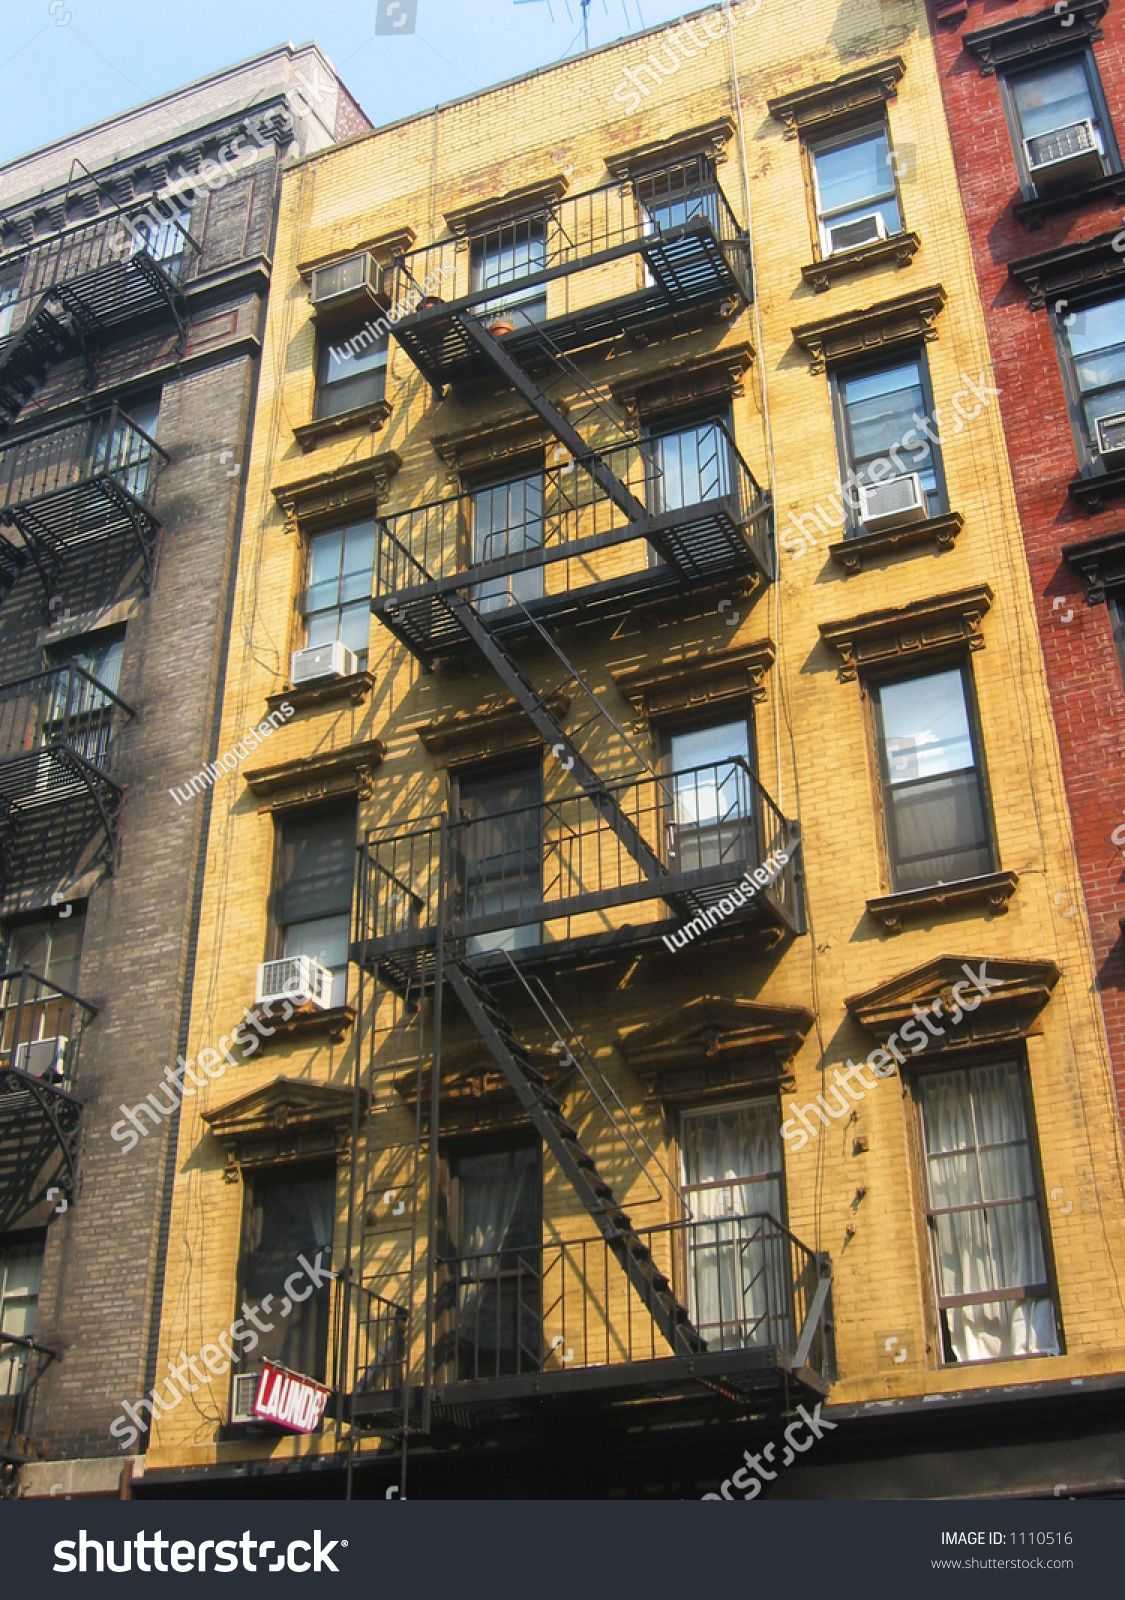 Fire Escapes Run Diagonally Down Colorful Stock Photo 1110516